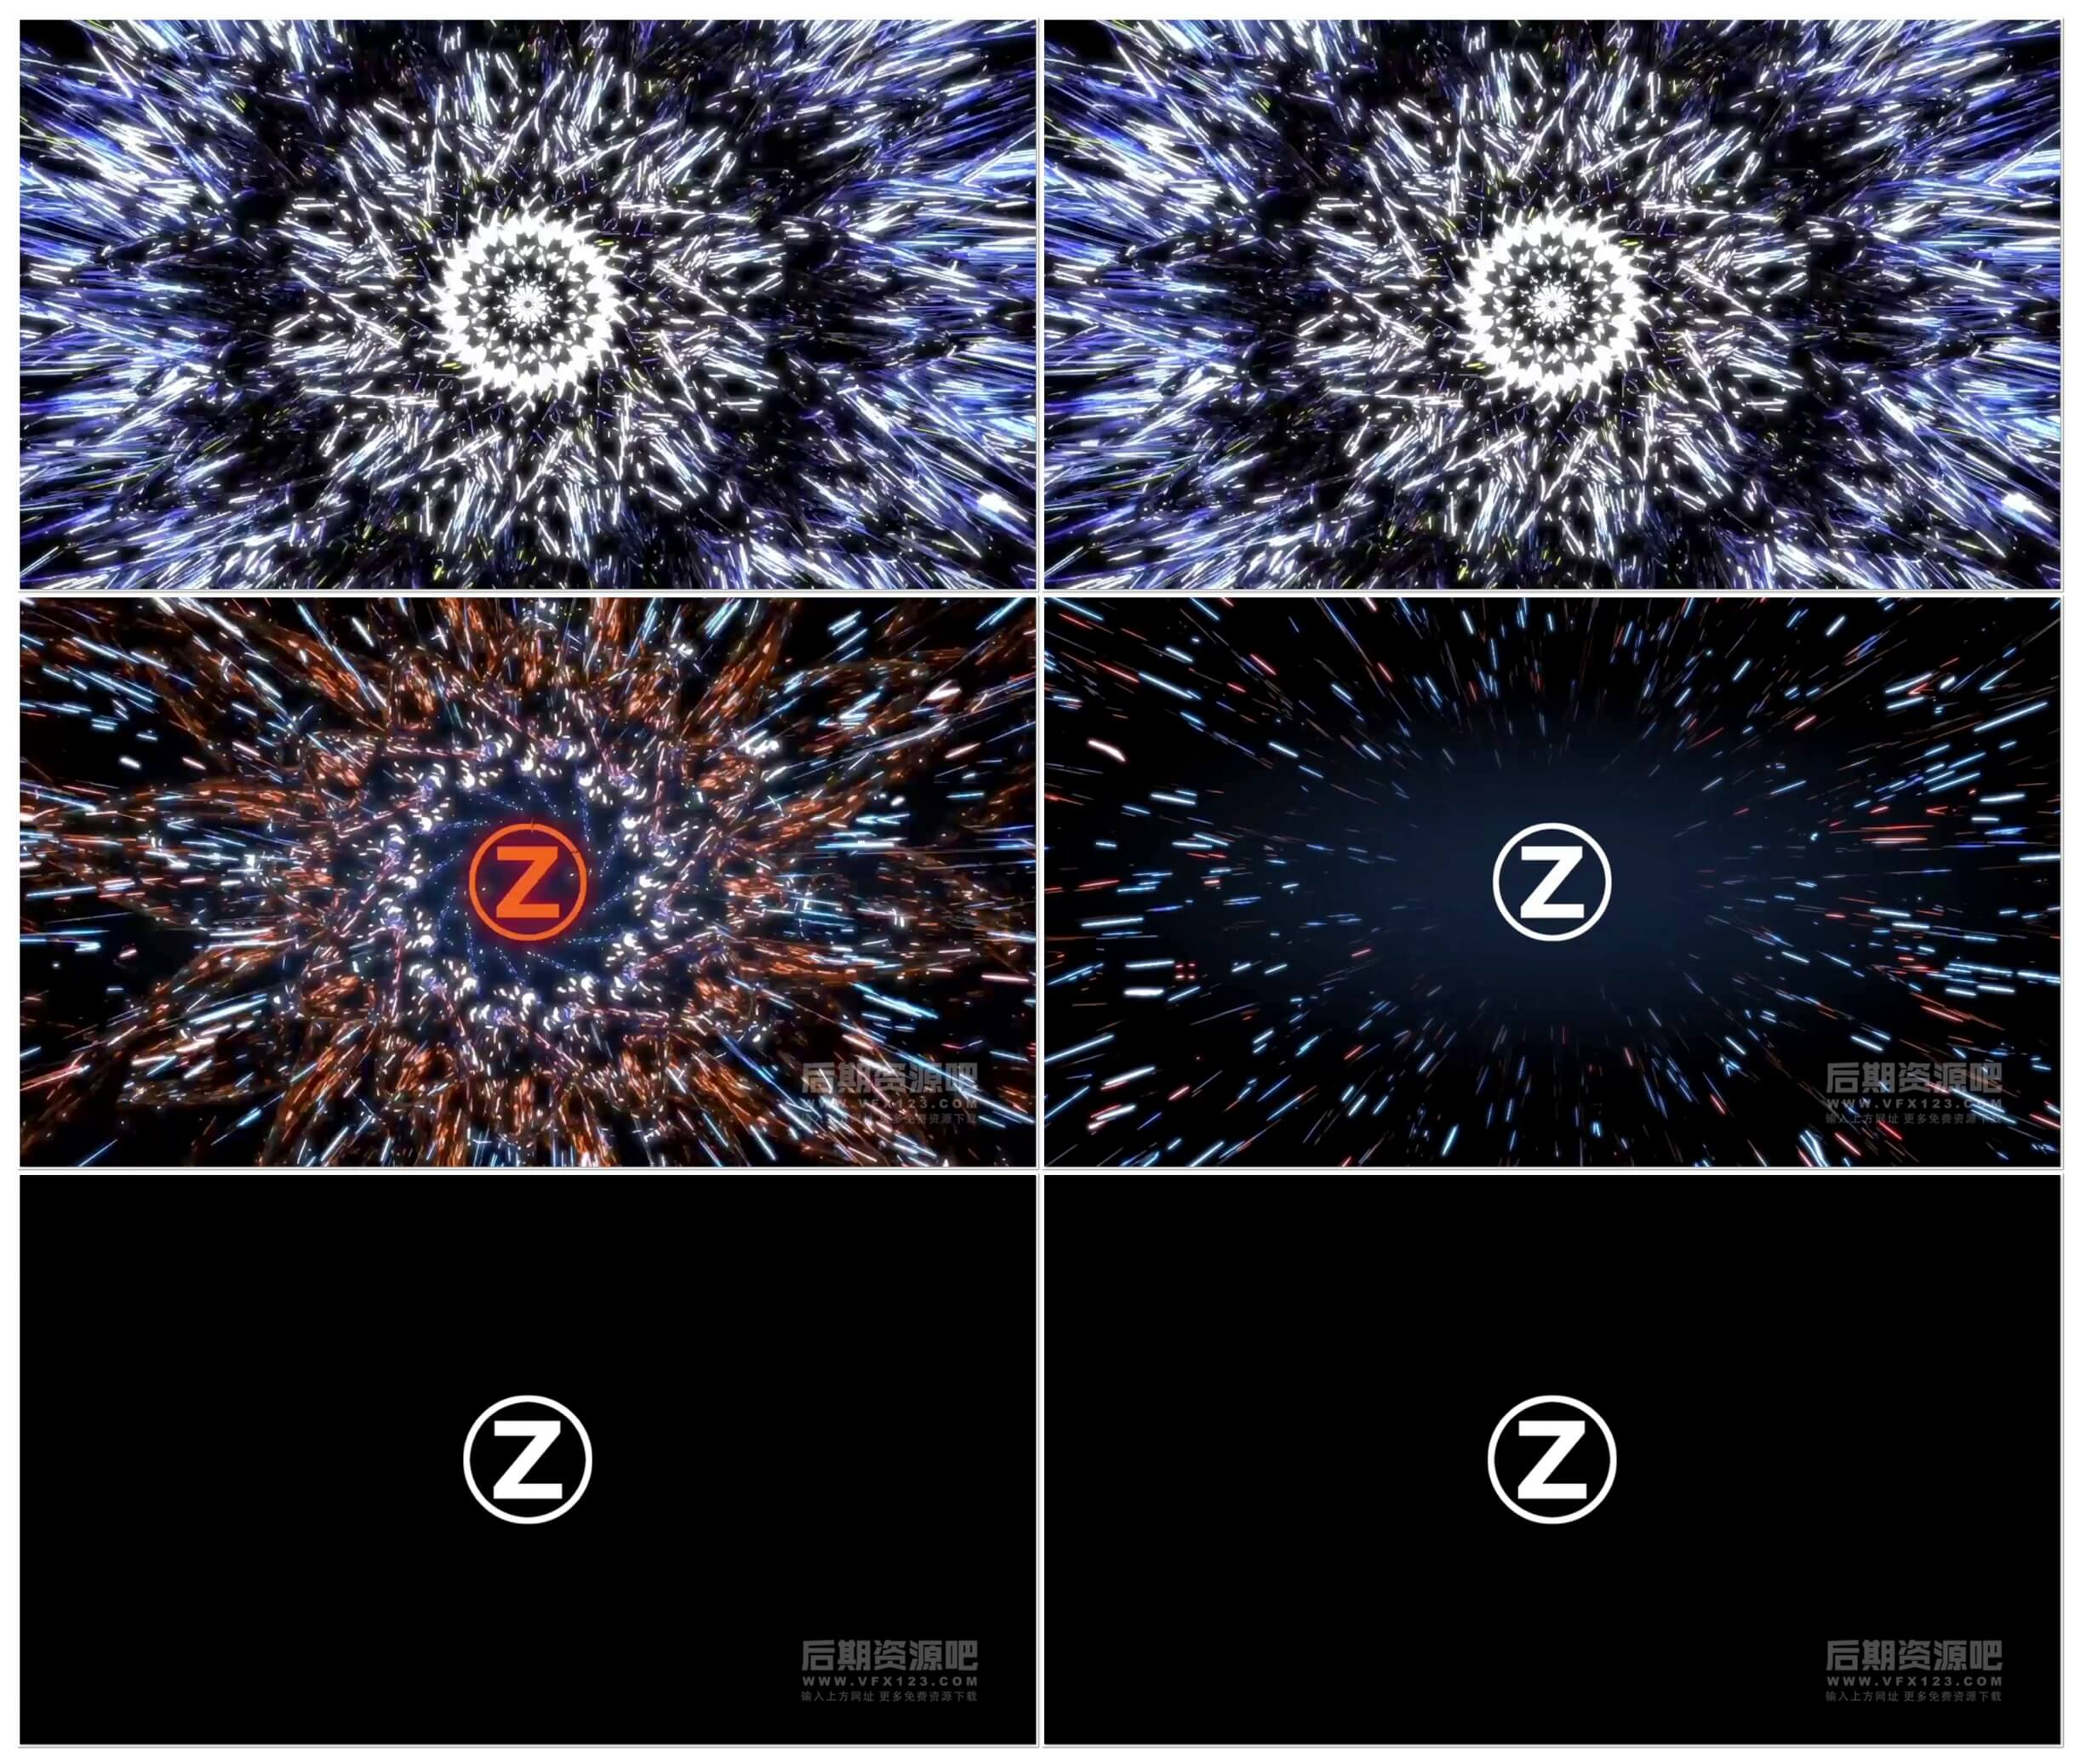 fcpx插件 万花筒抽象线条徽标LOGO展示片头模板 Abstract Hypnotic Logo